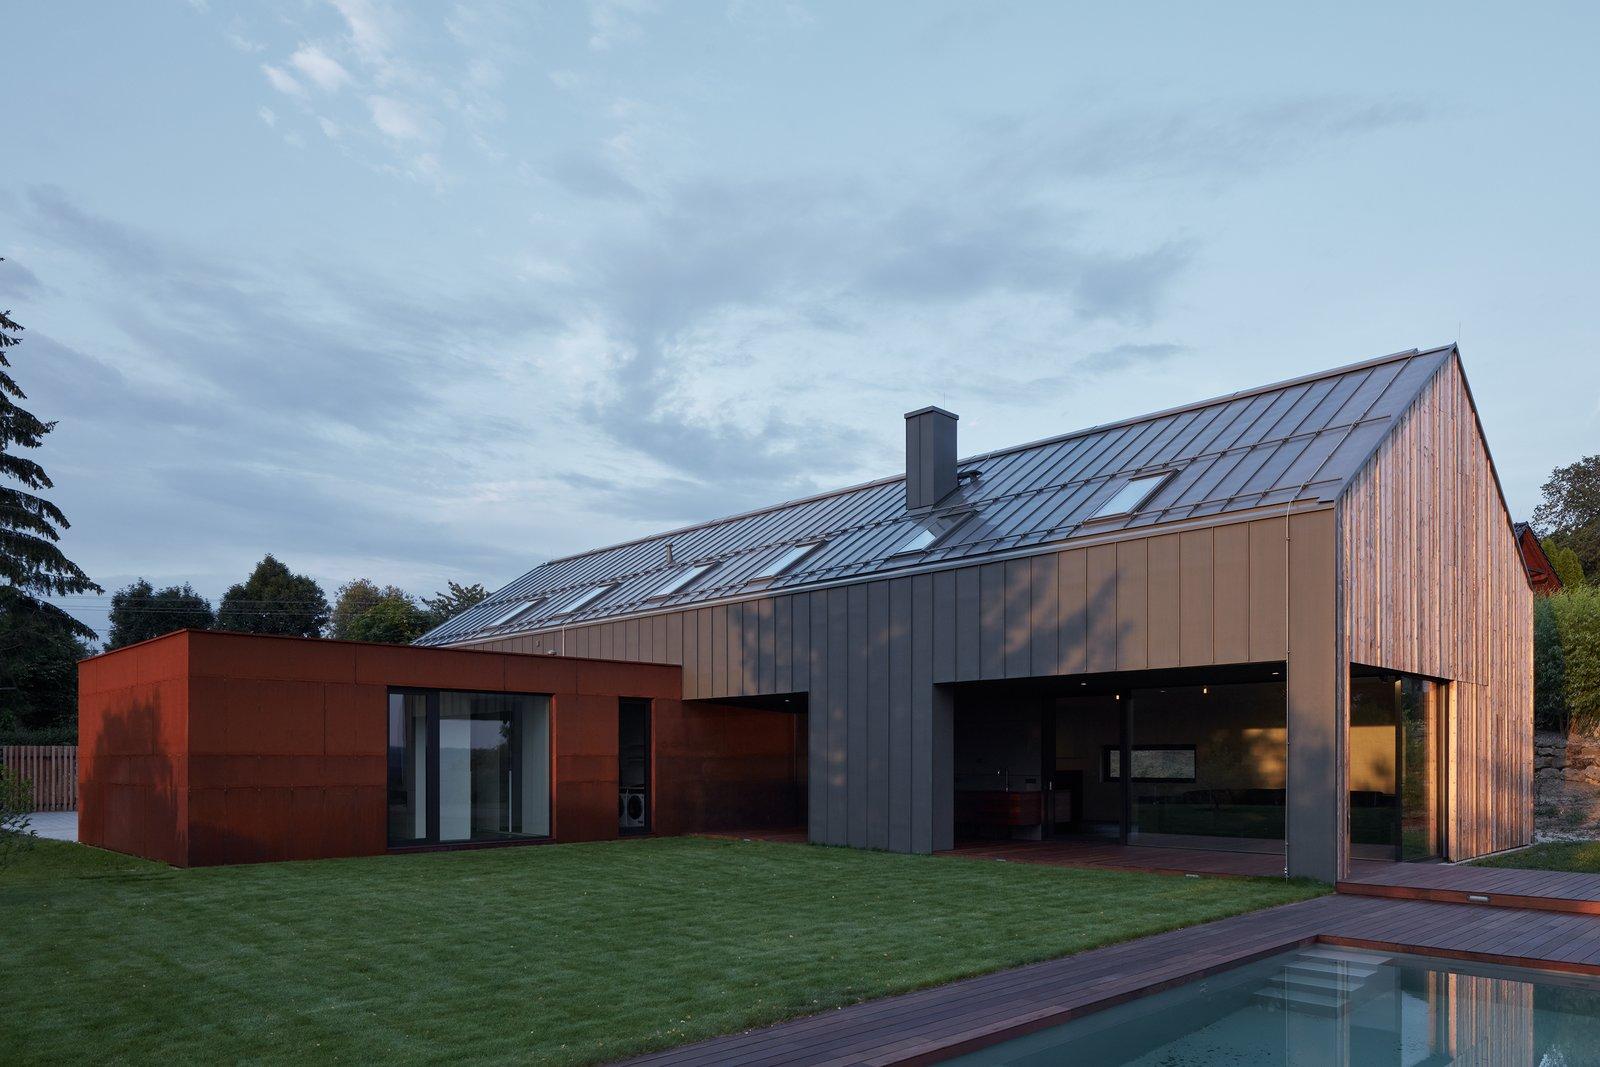 Engel House by BoysPlayNice Photography & Concept